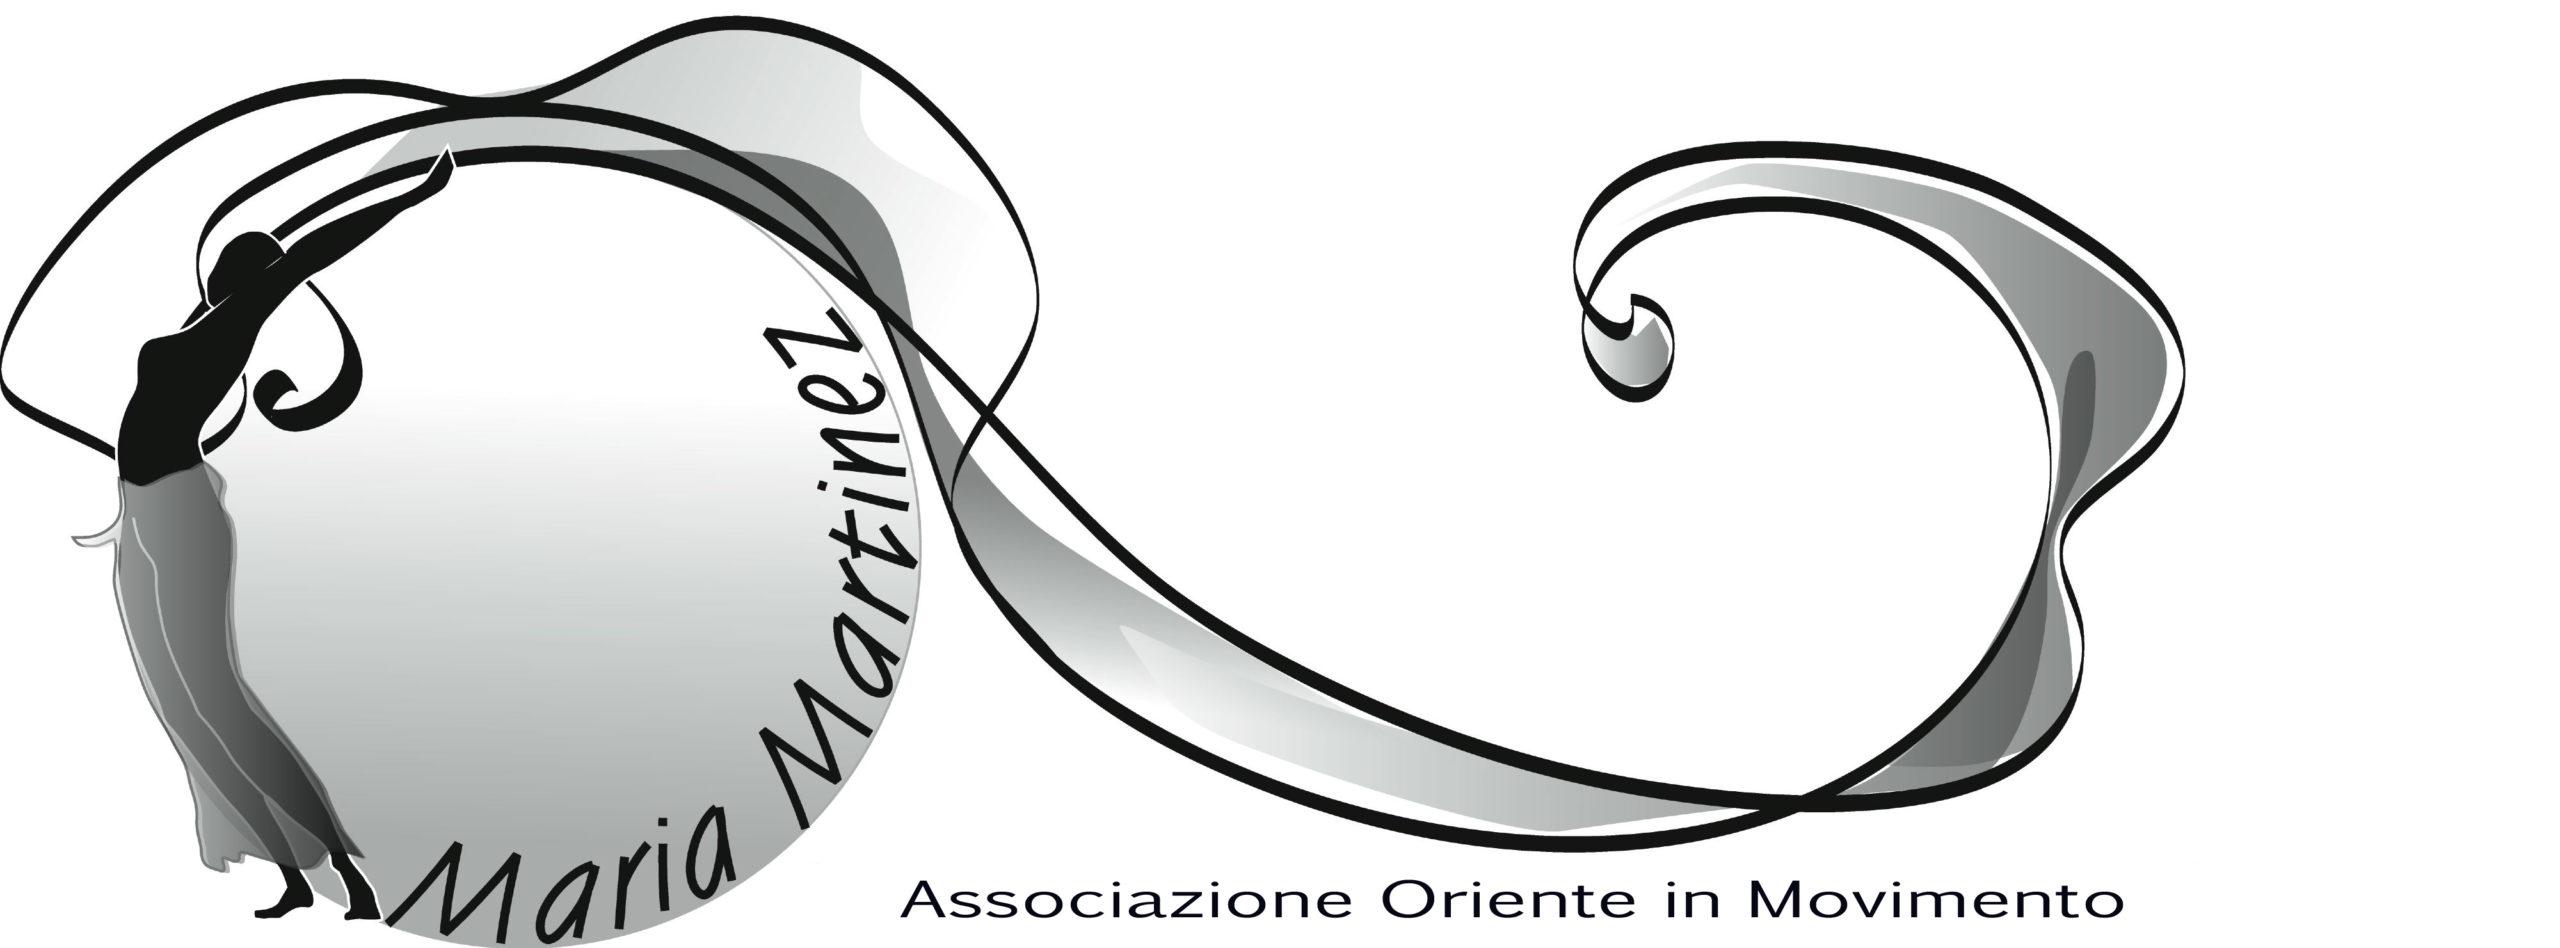 logo asociazione